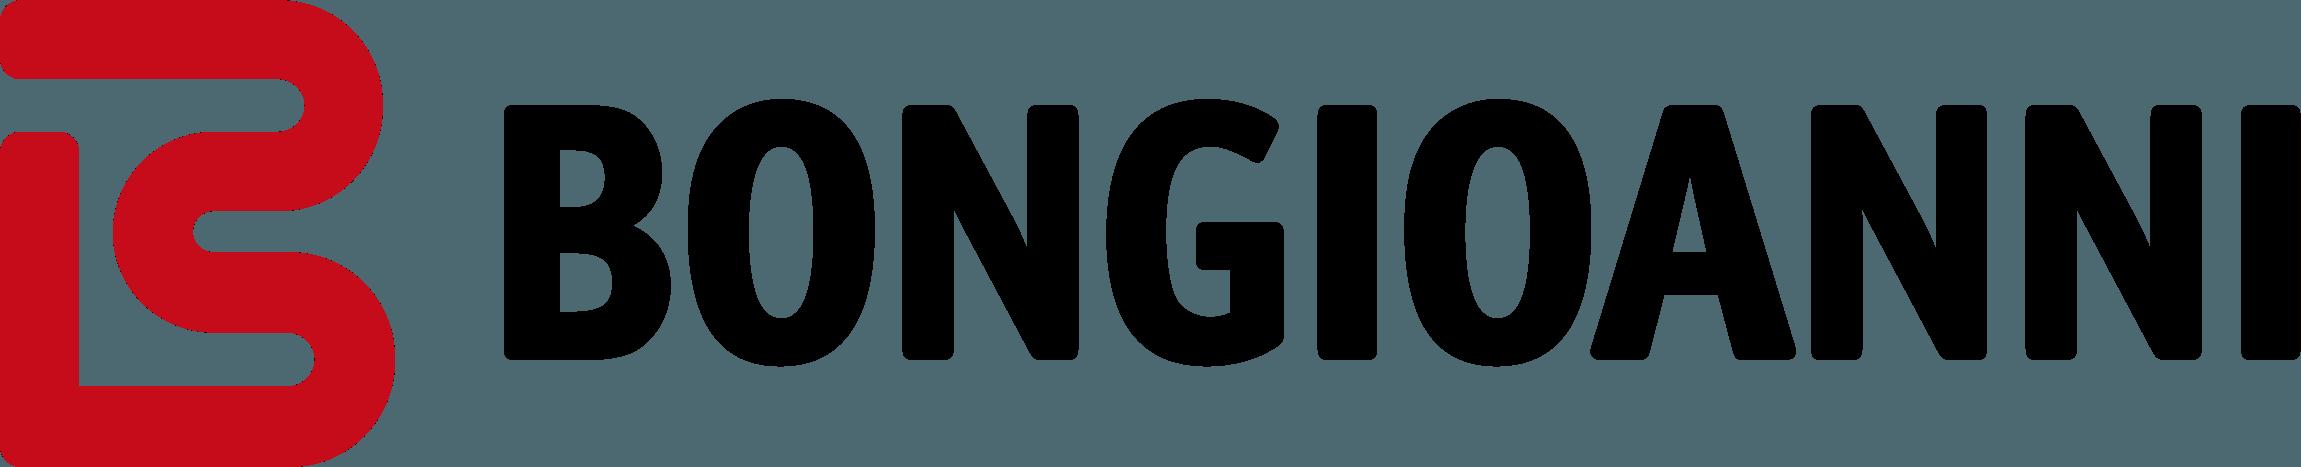 bongioanni logo